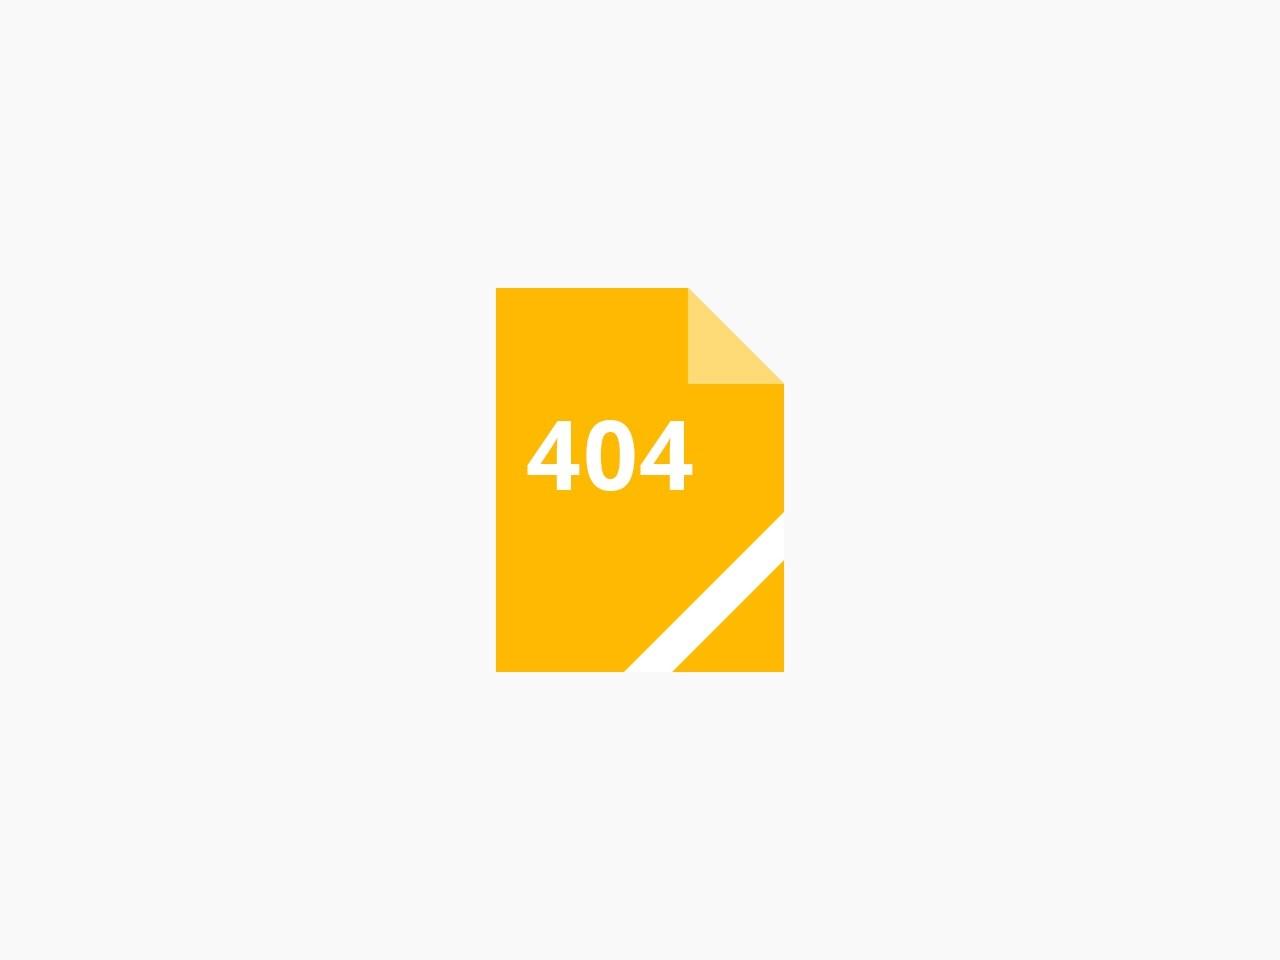 Bitcoin [BTC]: Venezuela registers over 16,000 BTC in trading volume via LocalBitcoin